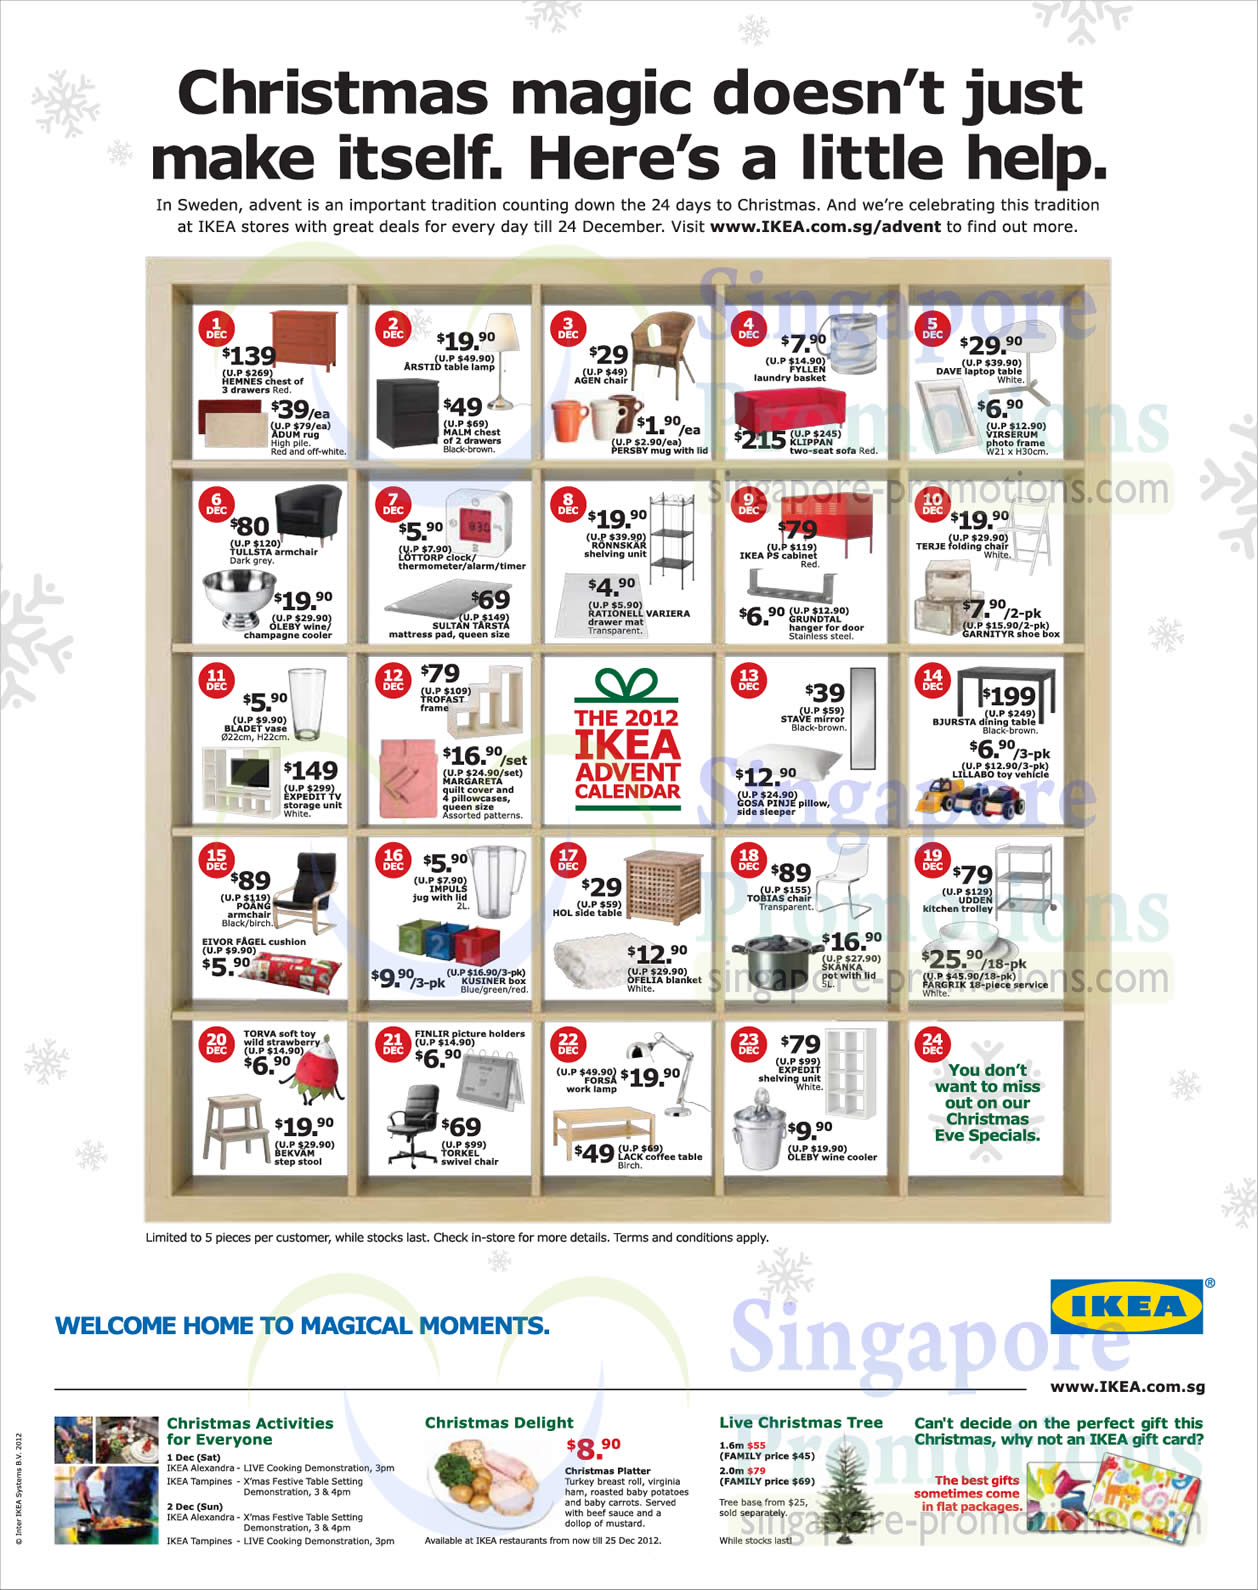 IKEA 2 Dec 2012